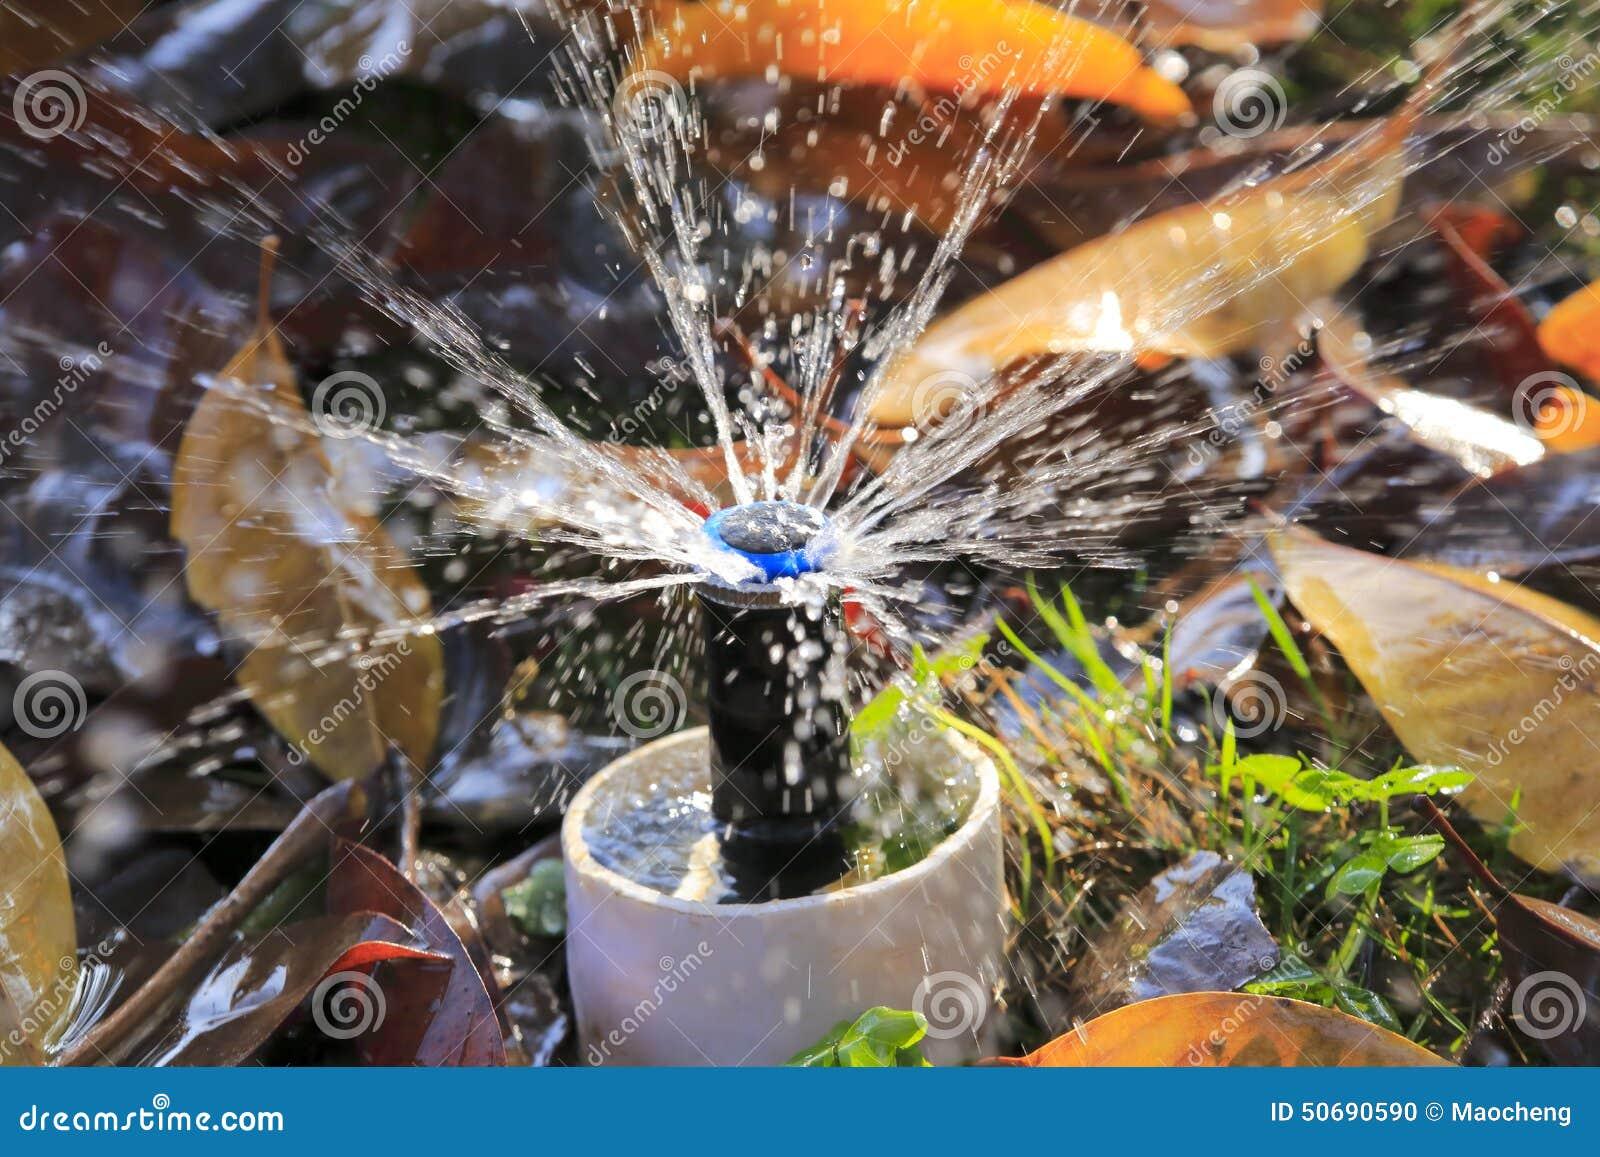 Download 喷水龙头 库存照片. 图片 包括有 龙头, 喷口, 湿气, 公园, 浪花, 下落, 排斥, 草甸, 管道 - 50690590